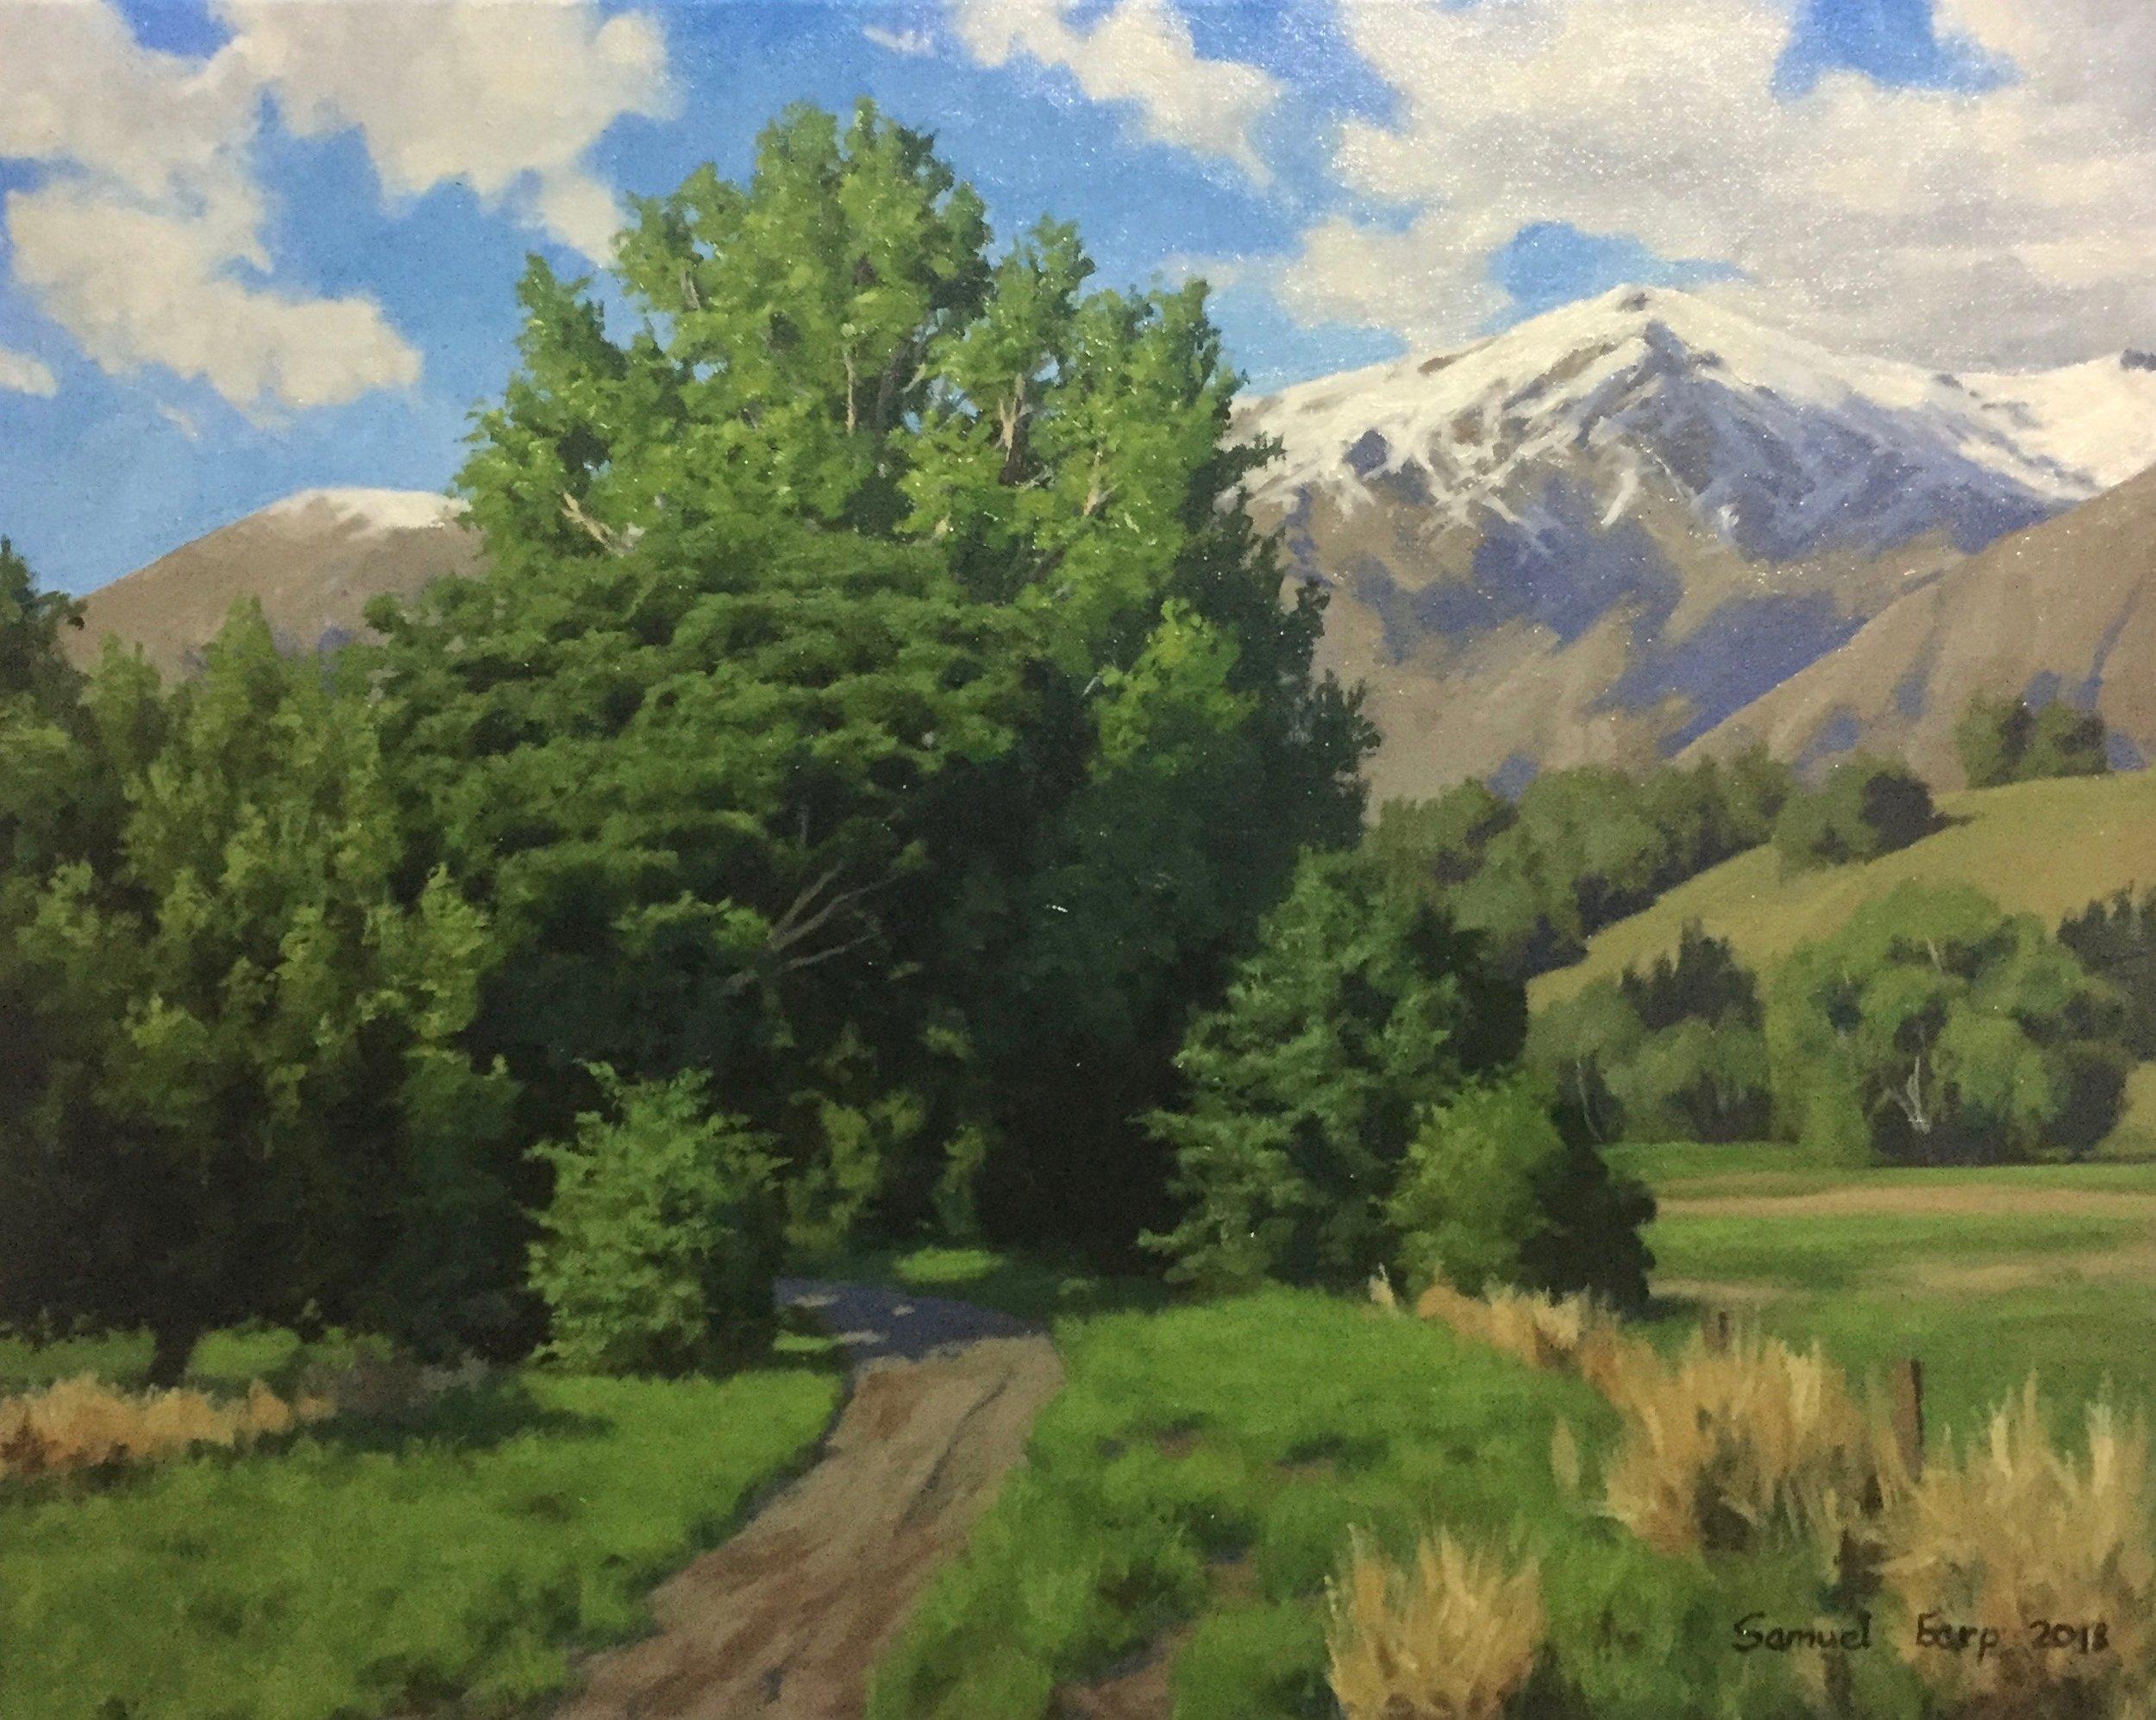 Poplar Trees and the Remarkables Mountains - oil painting - landscape - Samuel Earp - New Zealand landscape artist.jpg